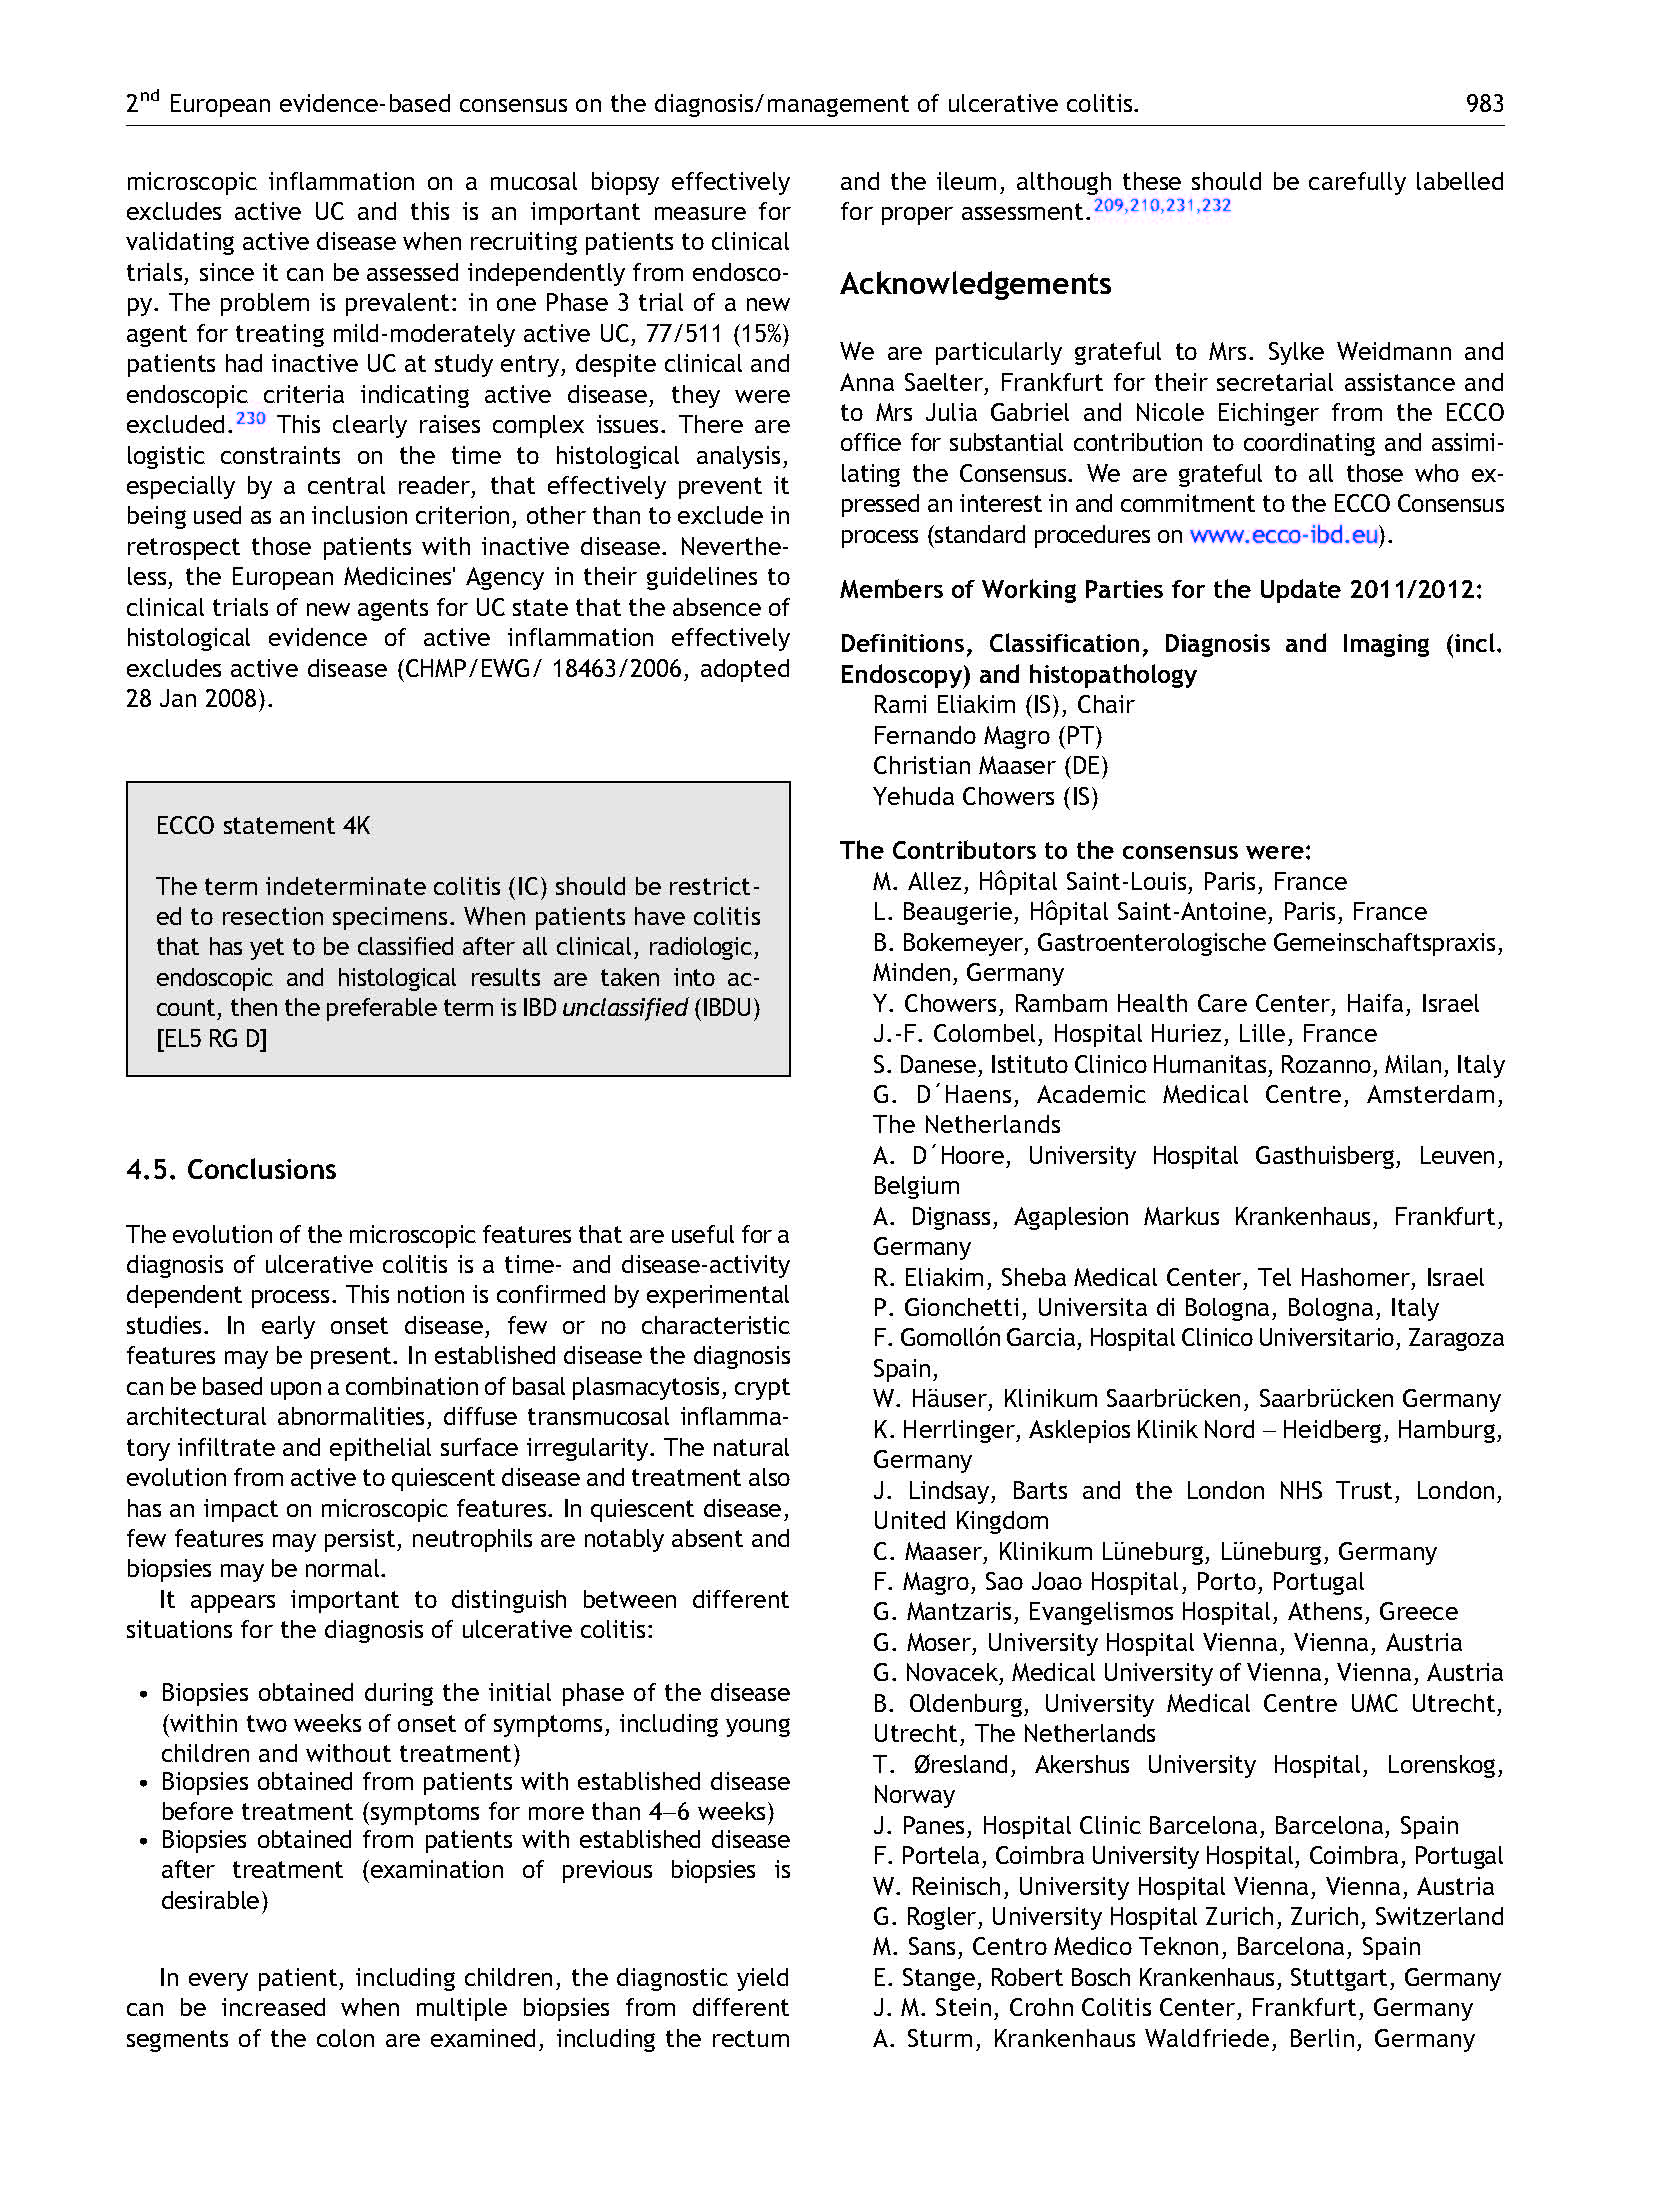 2012-ECCO第二版-欧洲询证共识:溃疡性结肠炎的诊断和处理—定义与诊断_页面_19.jpg